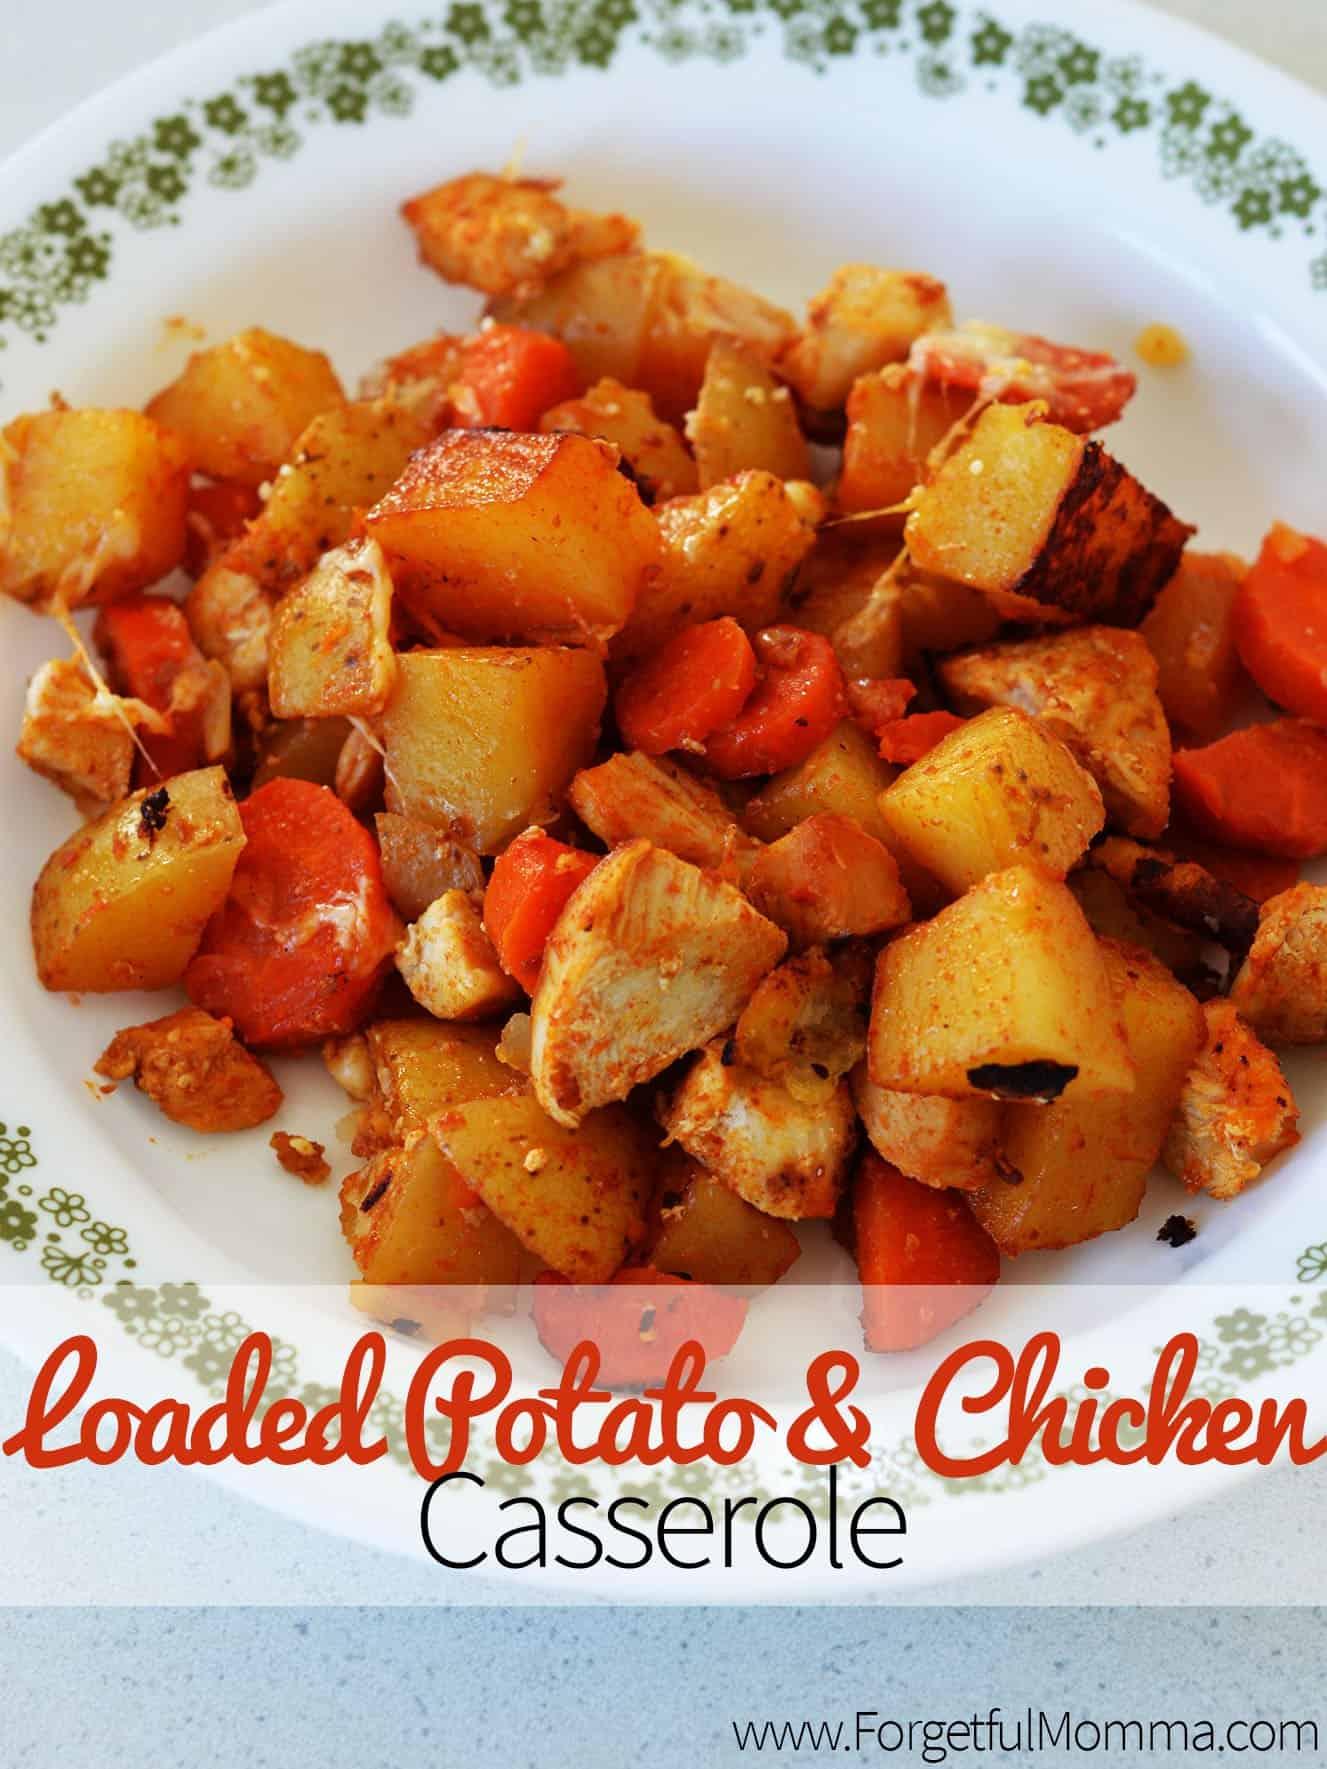 Loaded Potato & Chicken Casserole